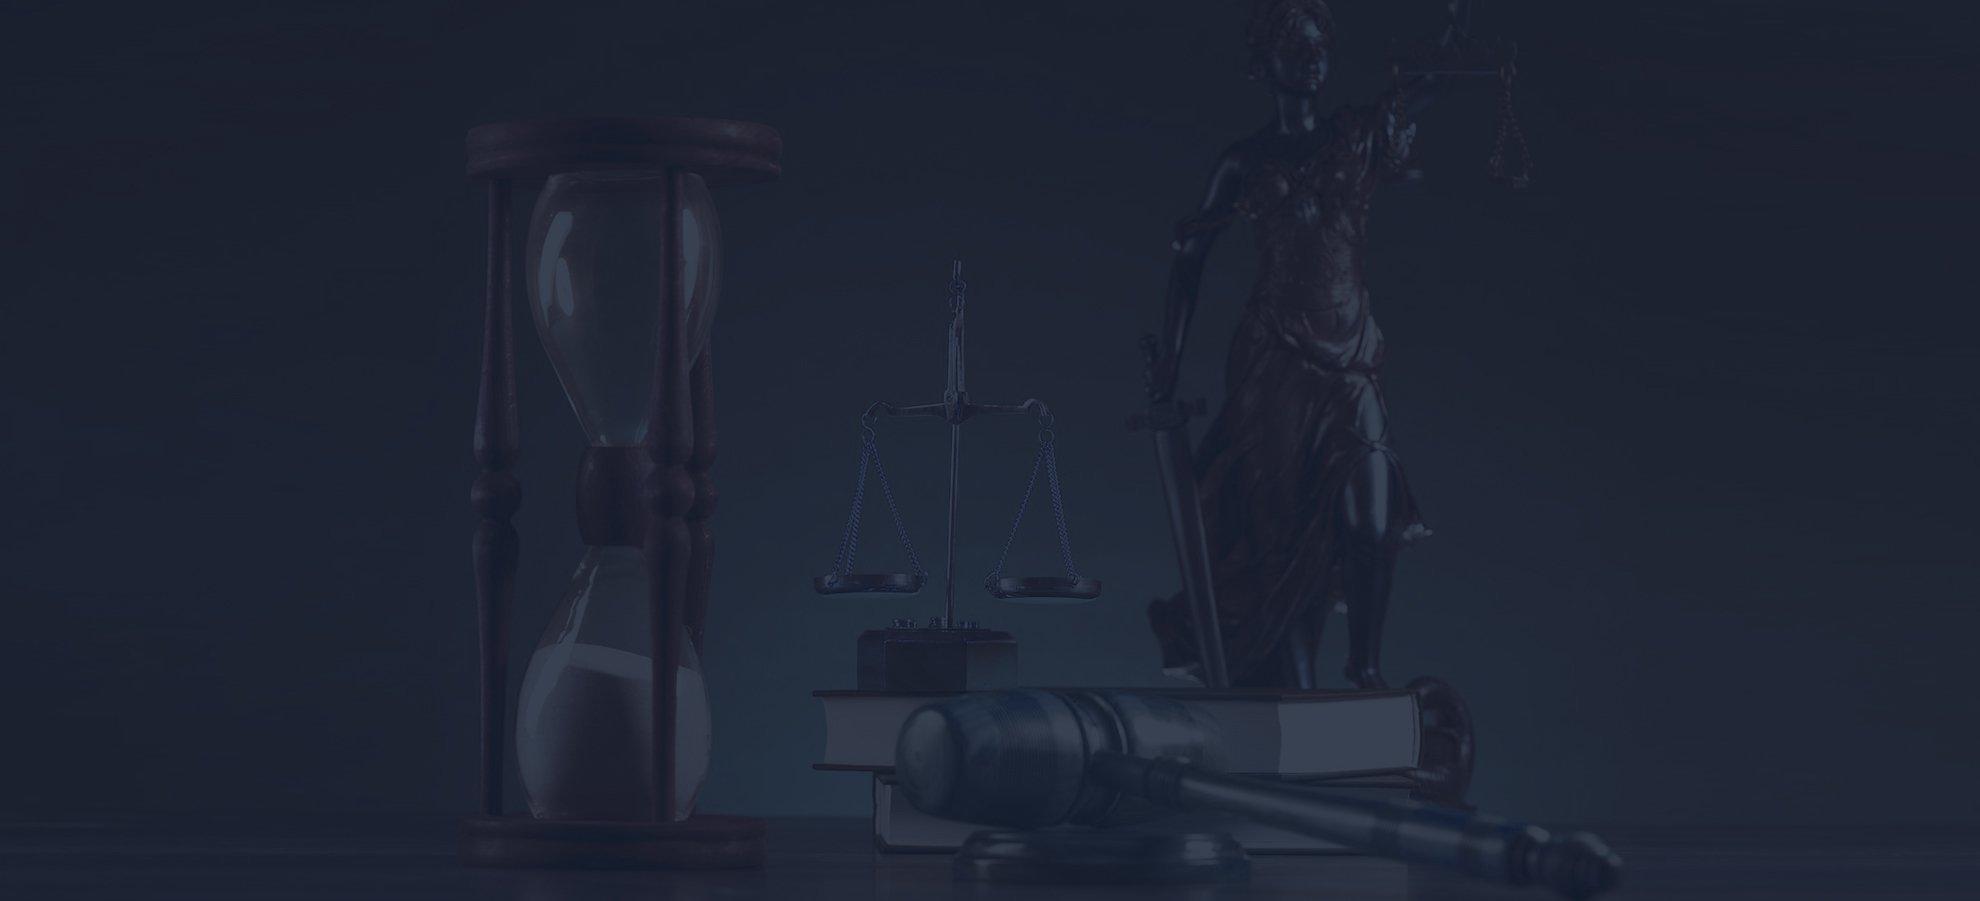 консультации юриста в бутово